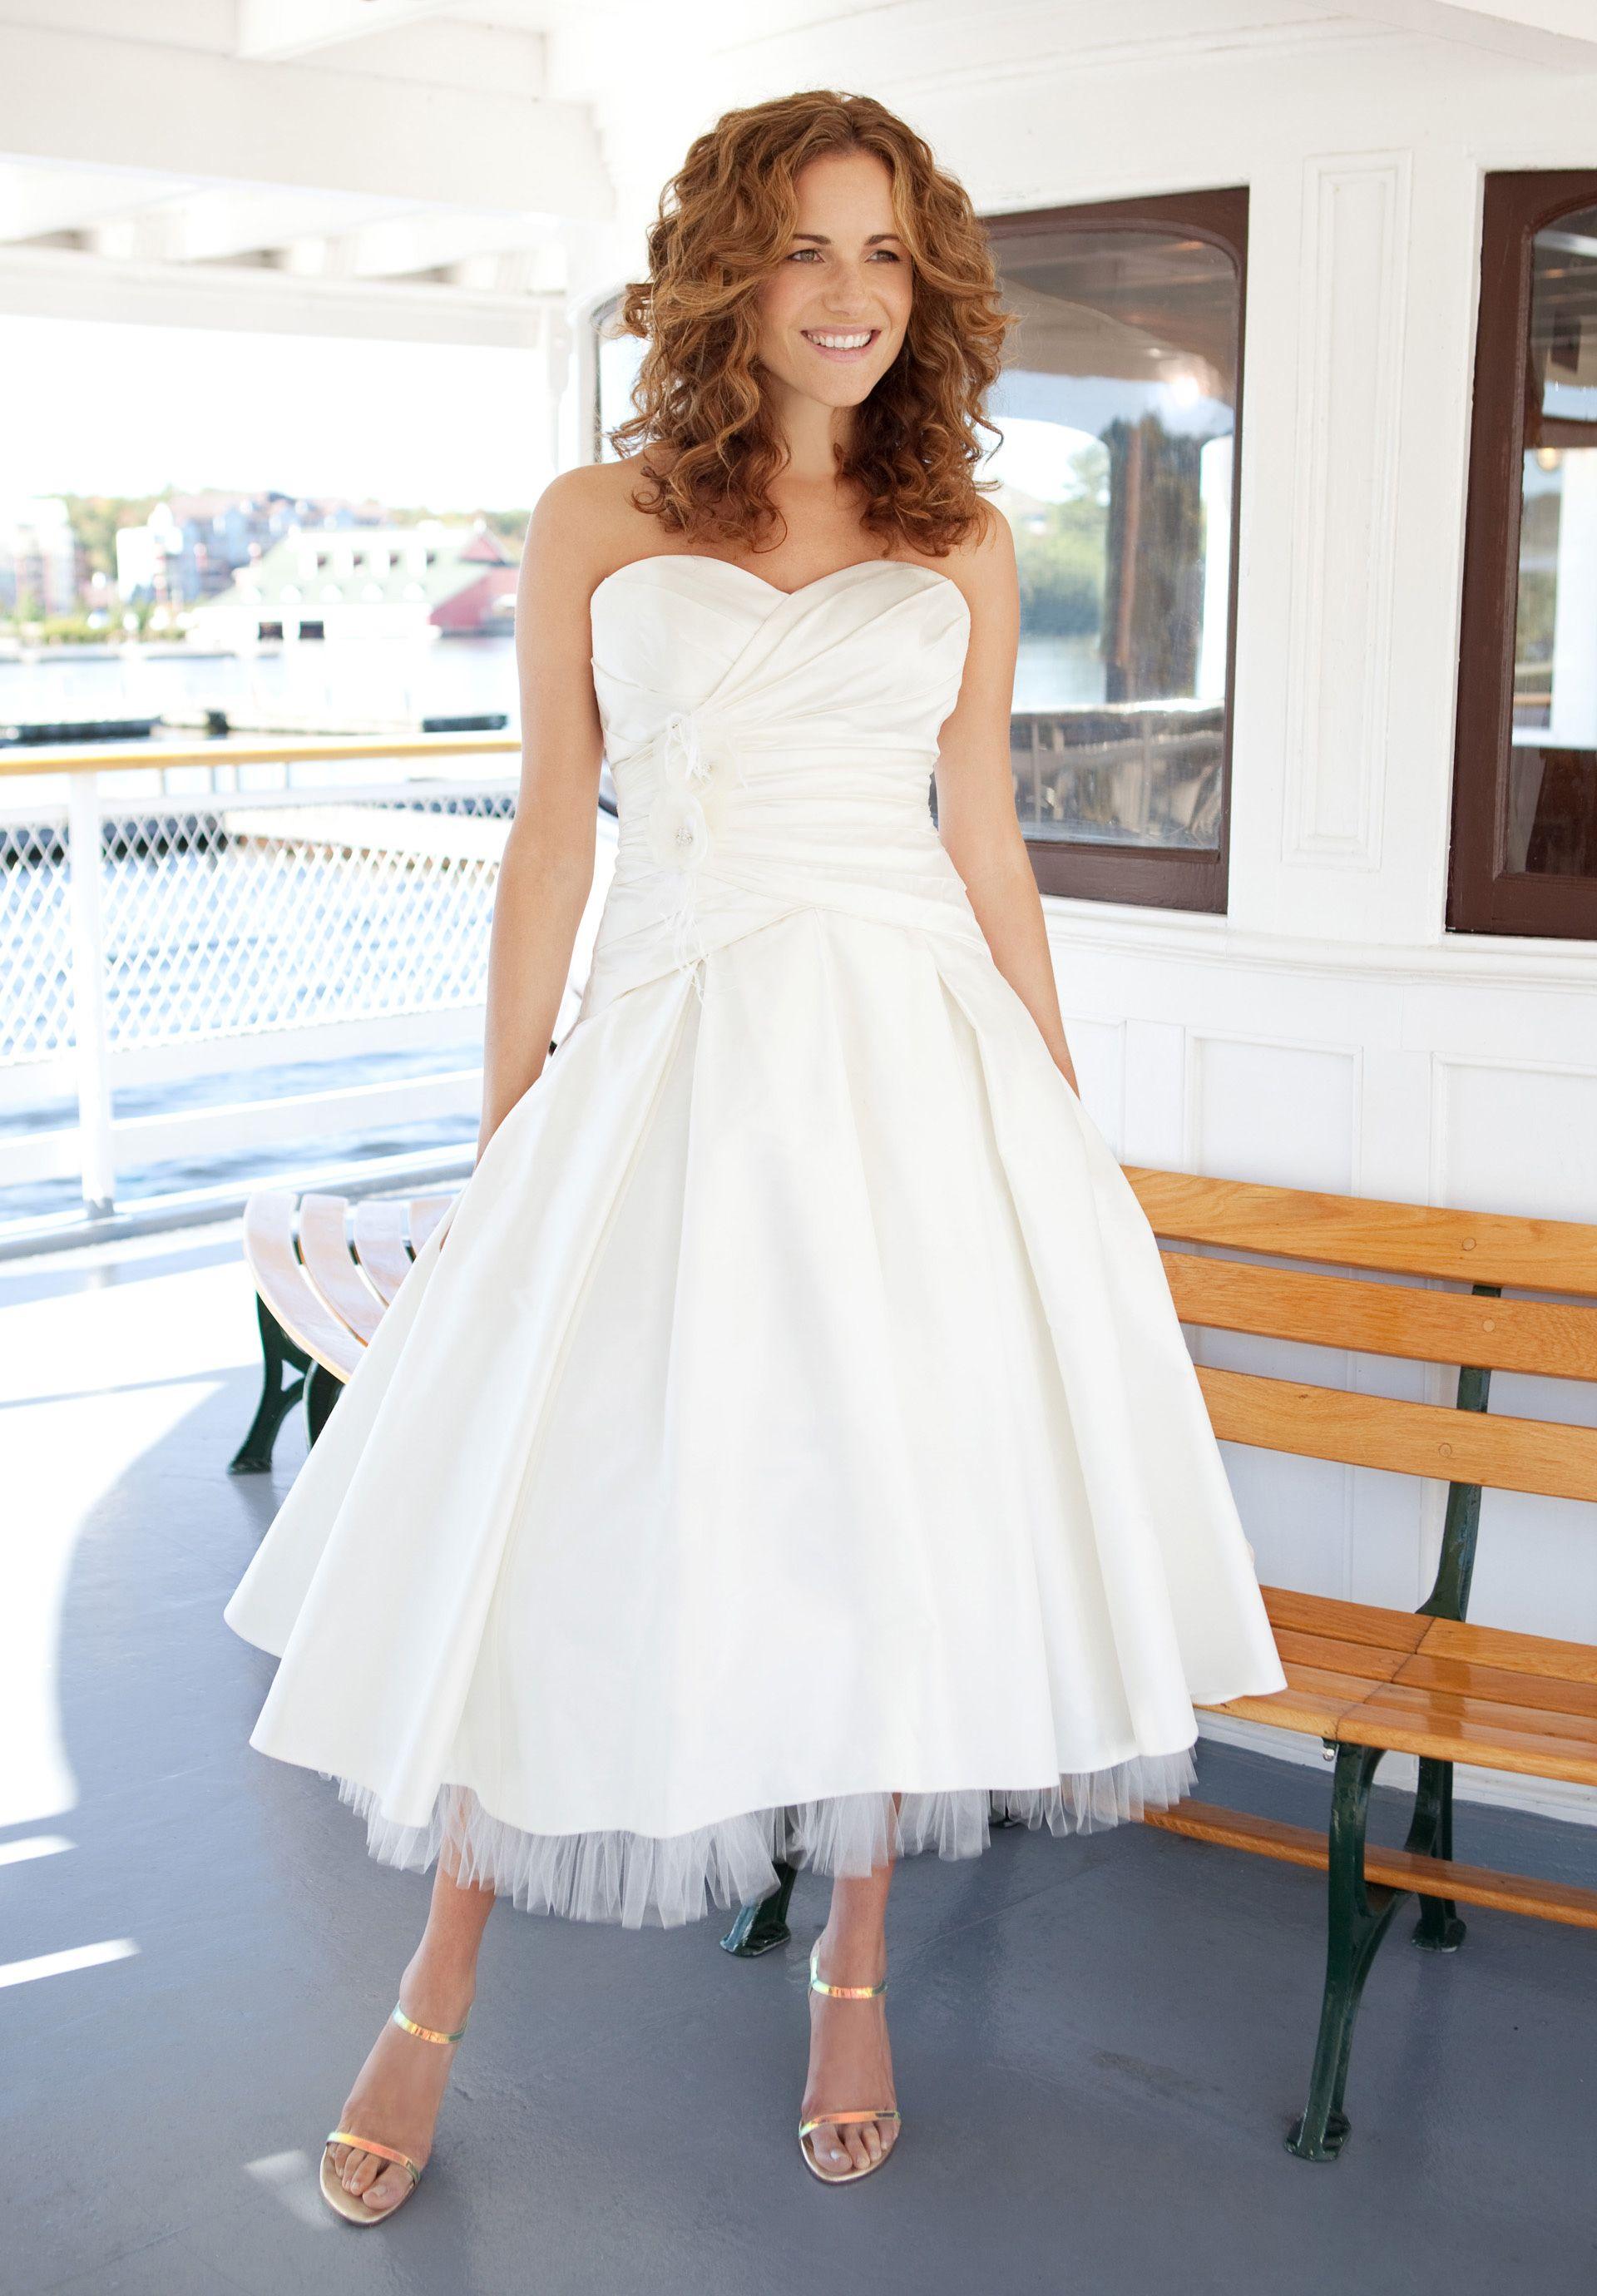 Wedding dresses tea length  Jessie by Lea Ann Belter is an adorable strapless dupioni silk tea